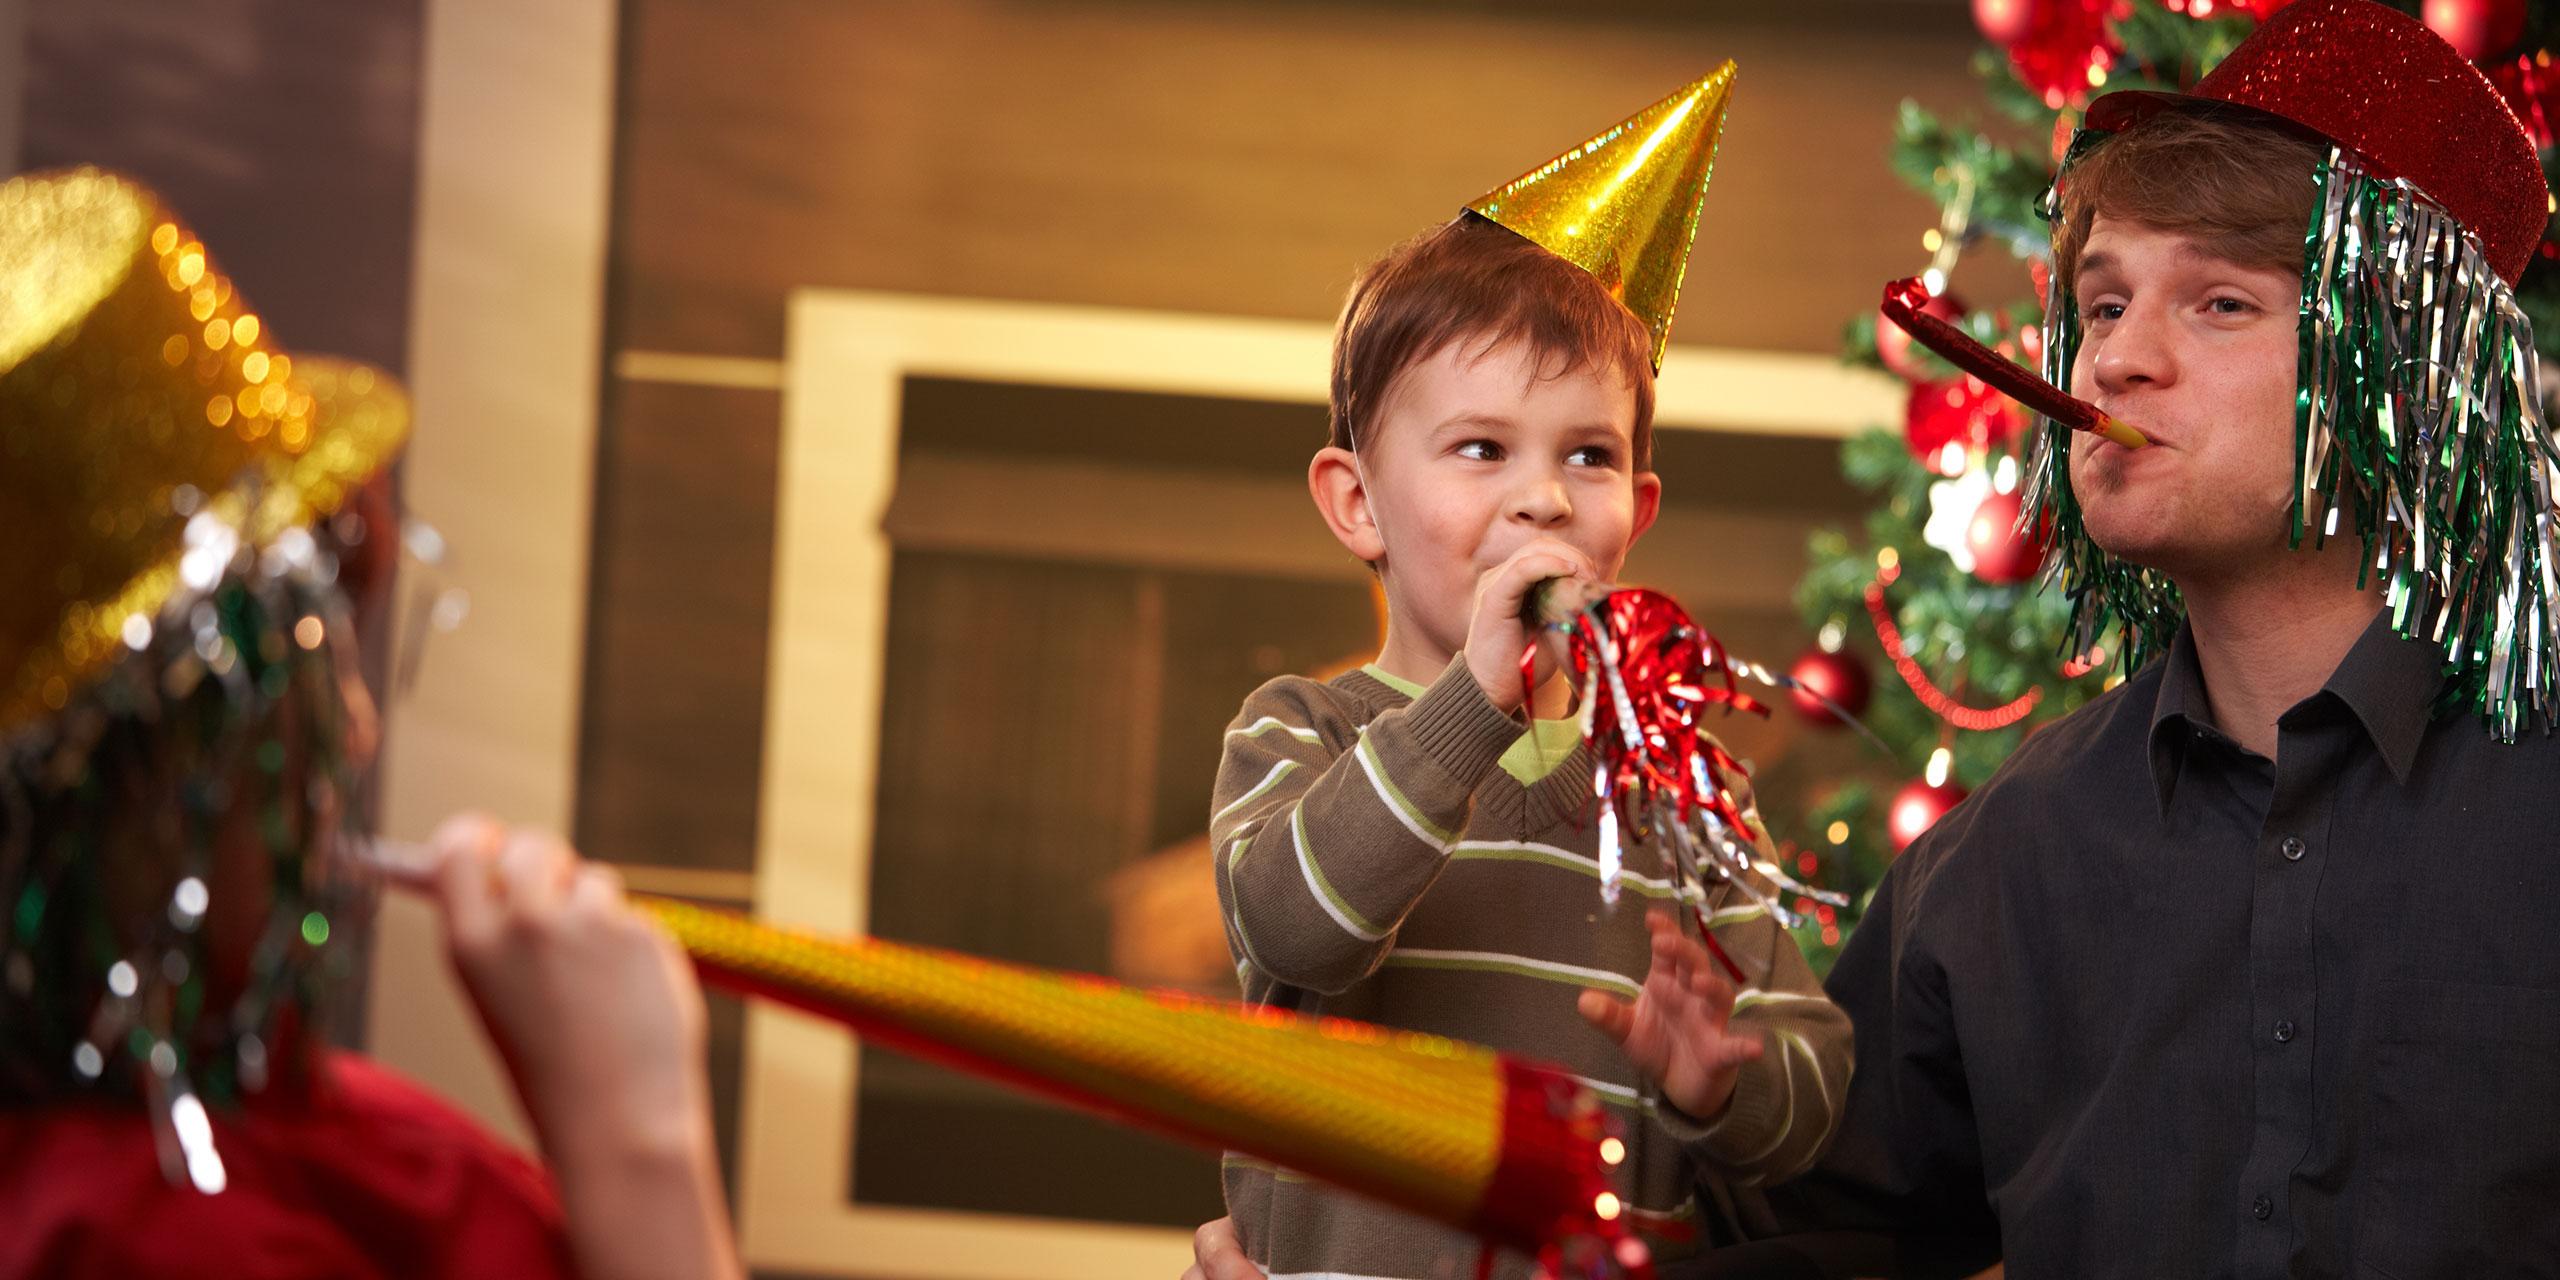 Family Celebrating New Year's Eve; Courtesy of StockLite/Shutterstock.com